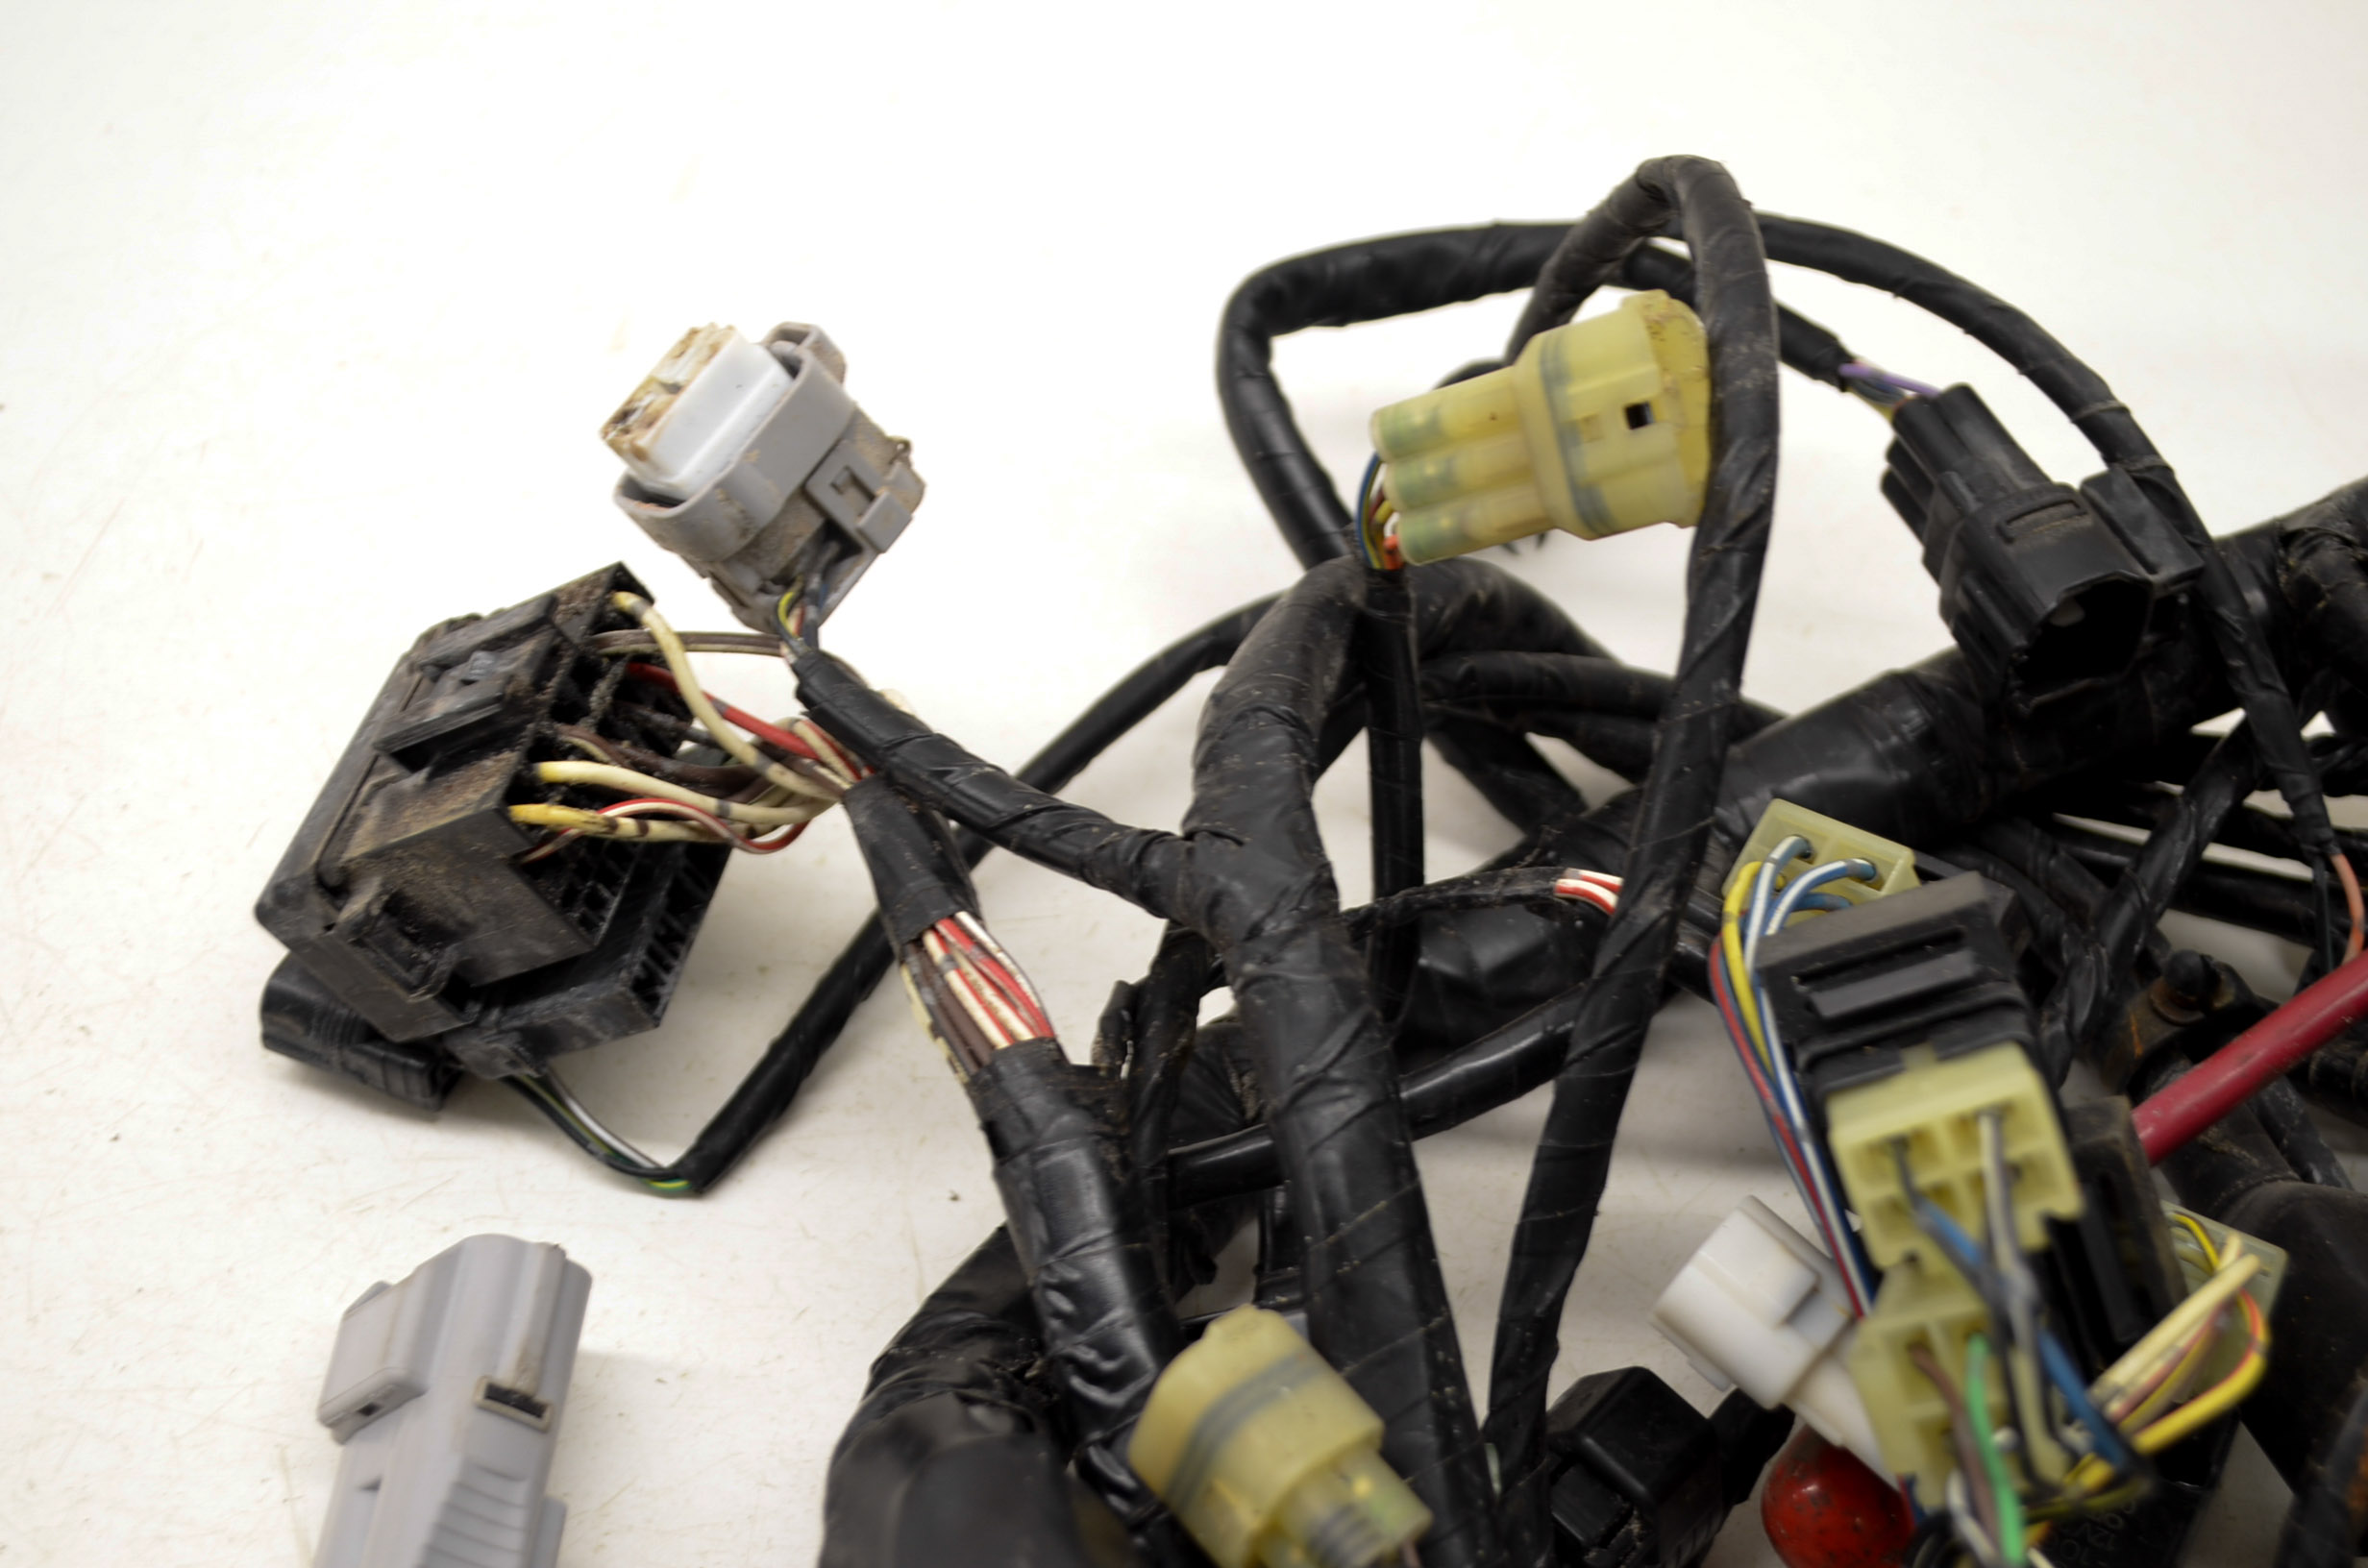 15 Kawasaki Brute Force 750 Wire Harness Electrical Wiring ...